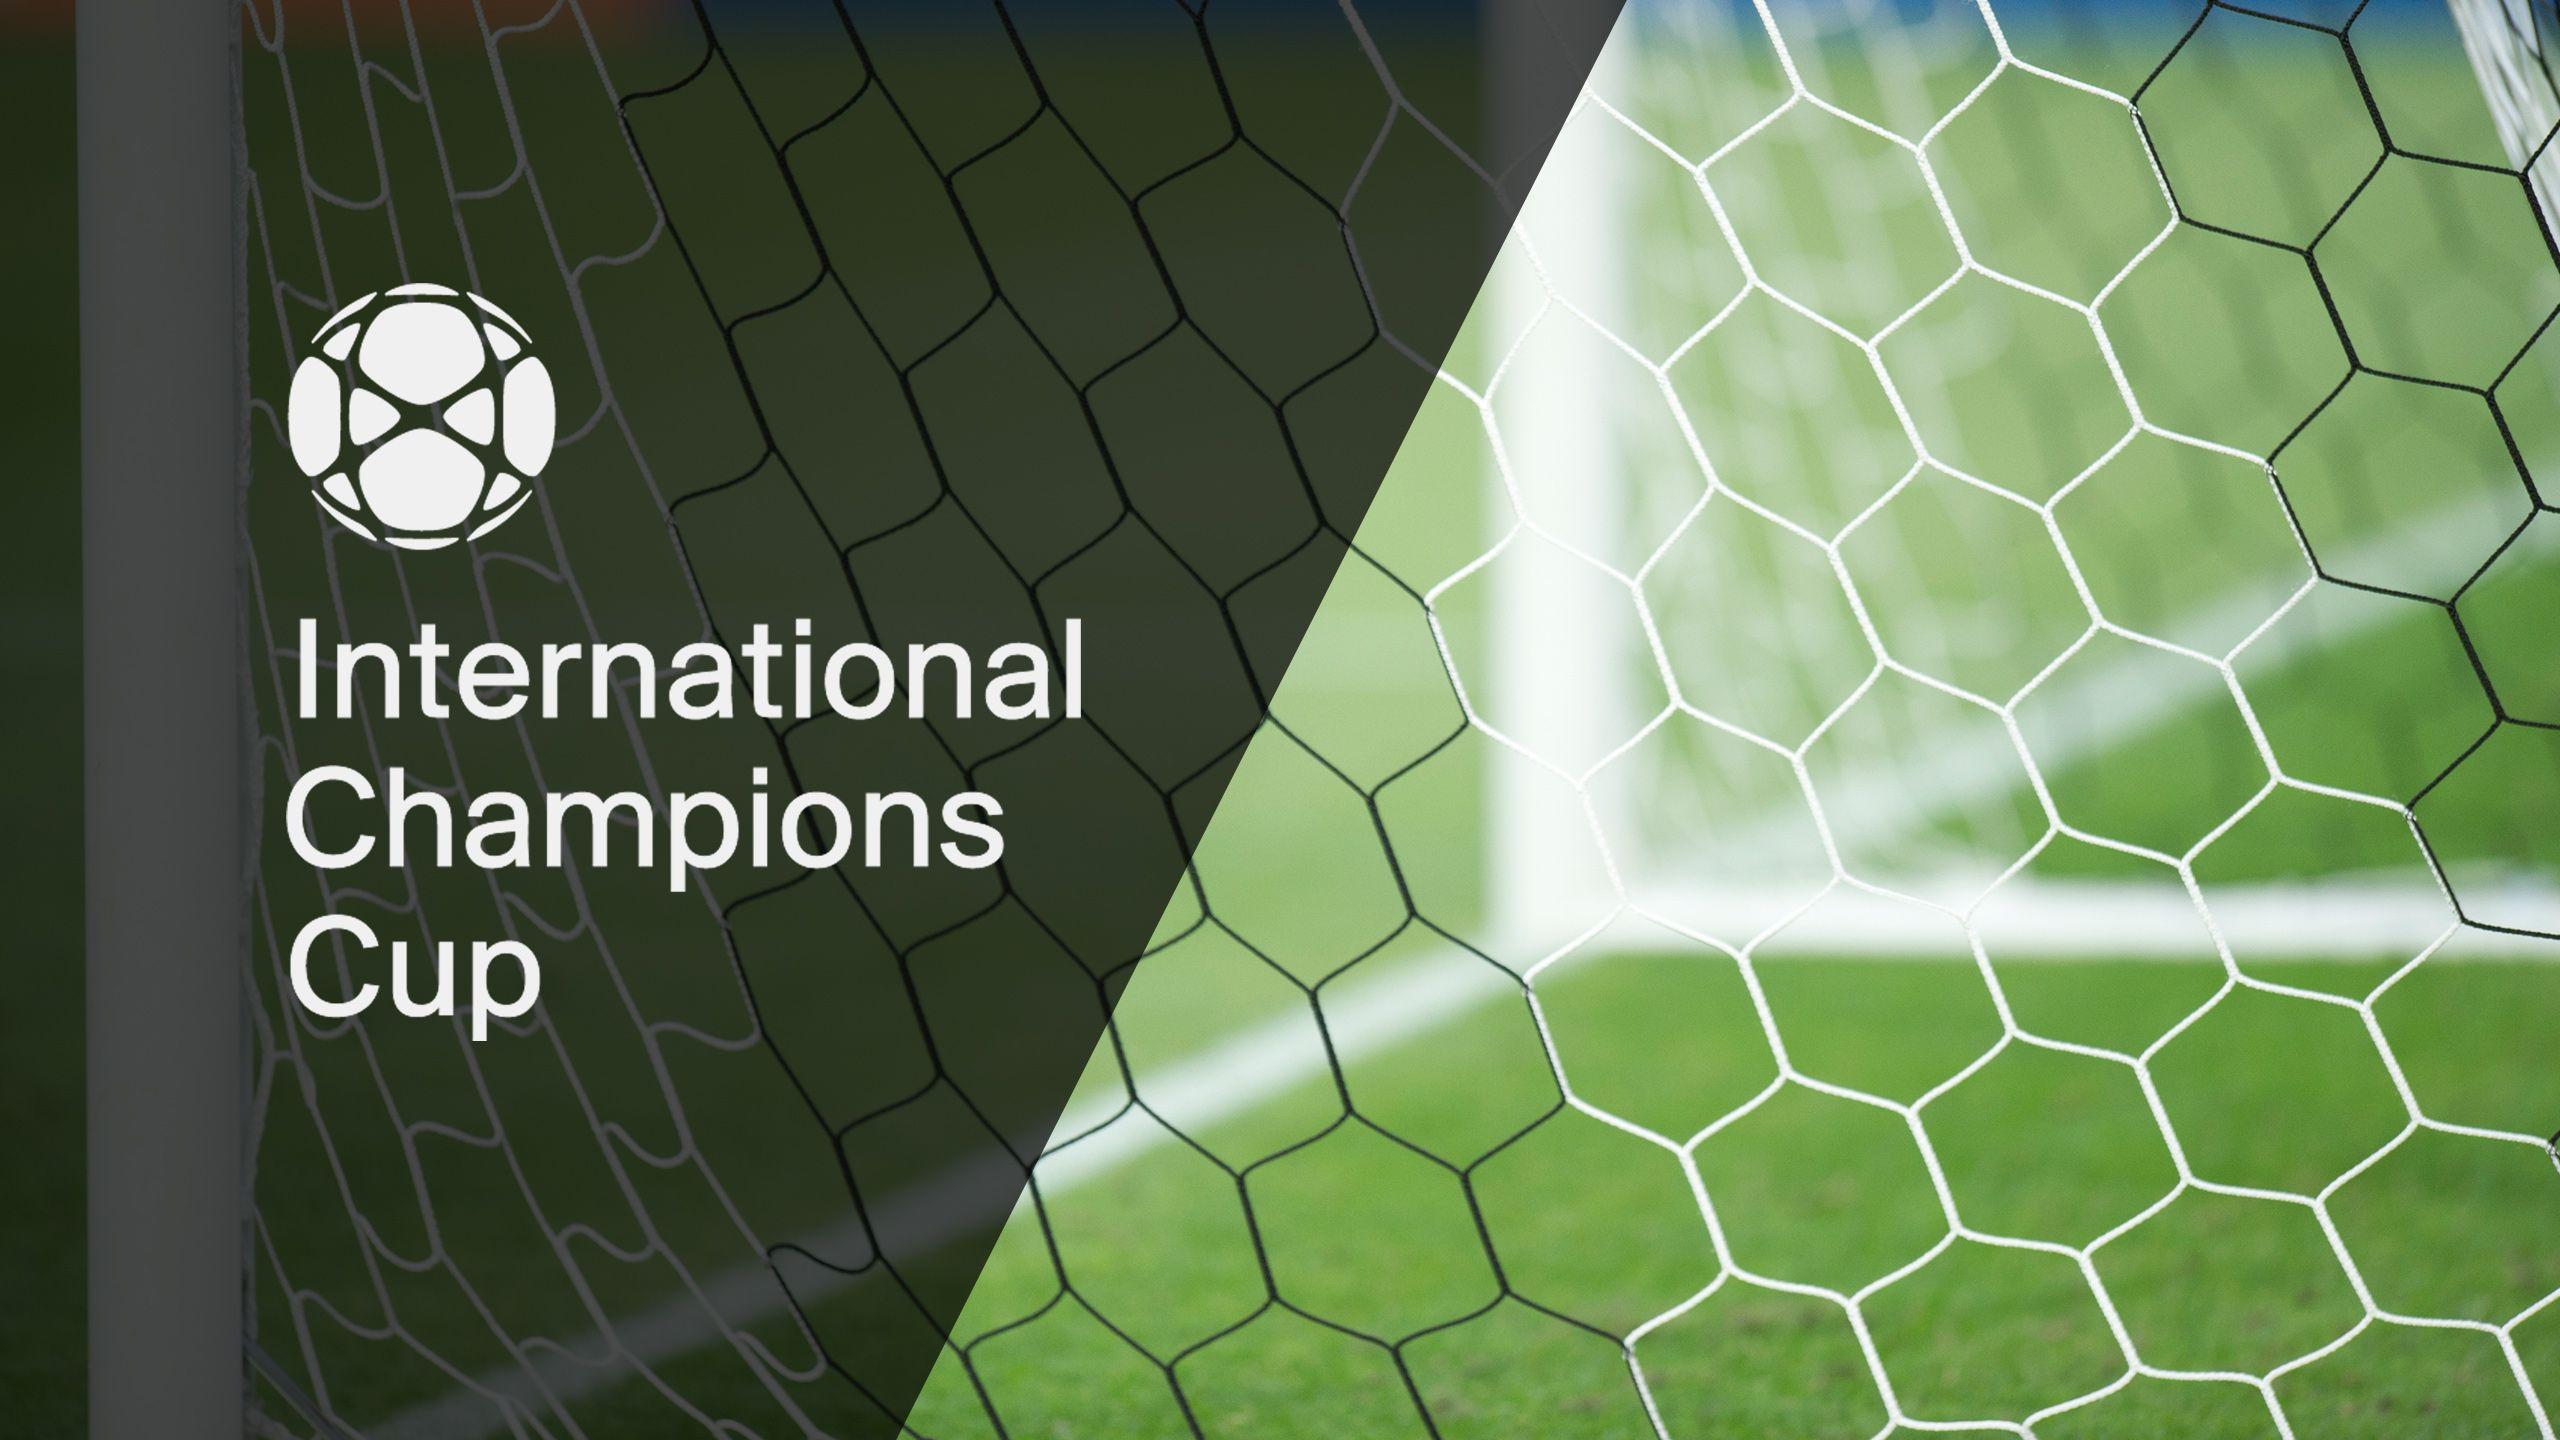 Bayern Munich vs. Paris Saint Germain (International Champions Cup)